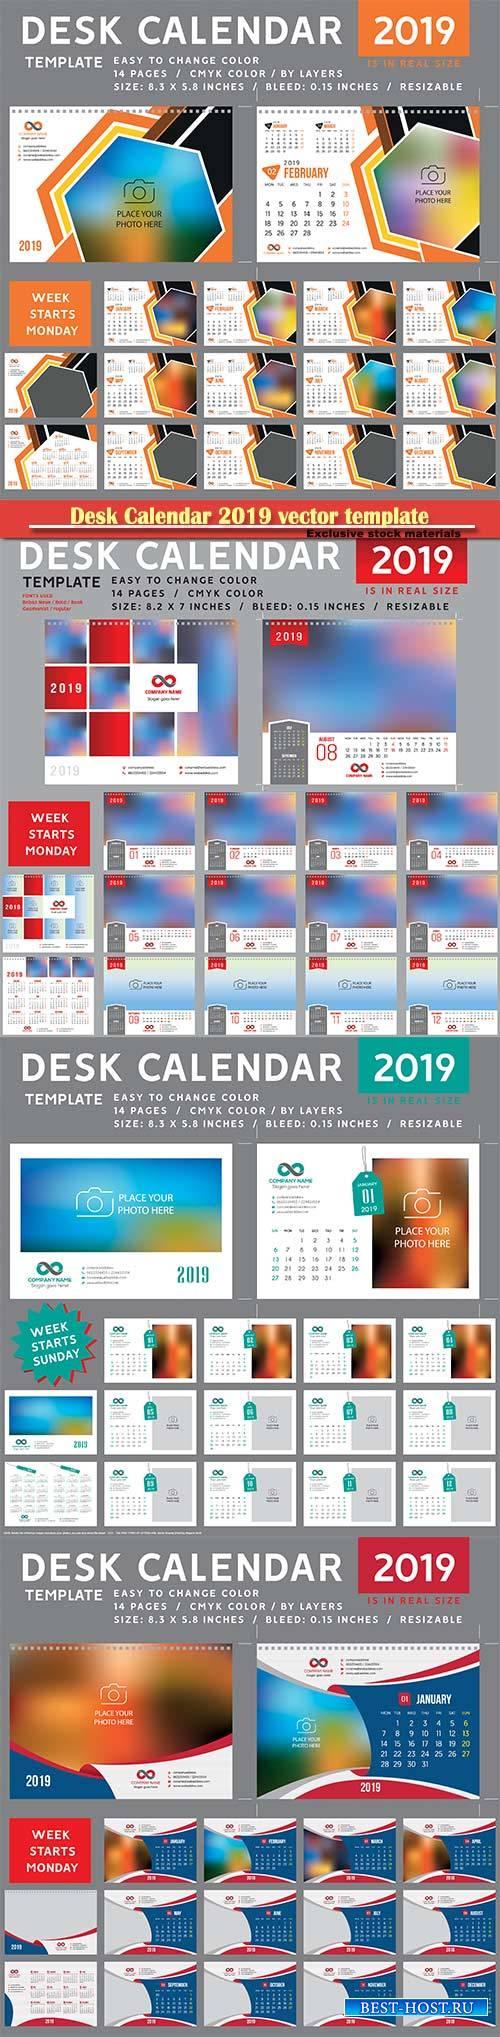 Desk Calendar 2019 vector template, 12 months included # 5